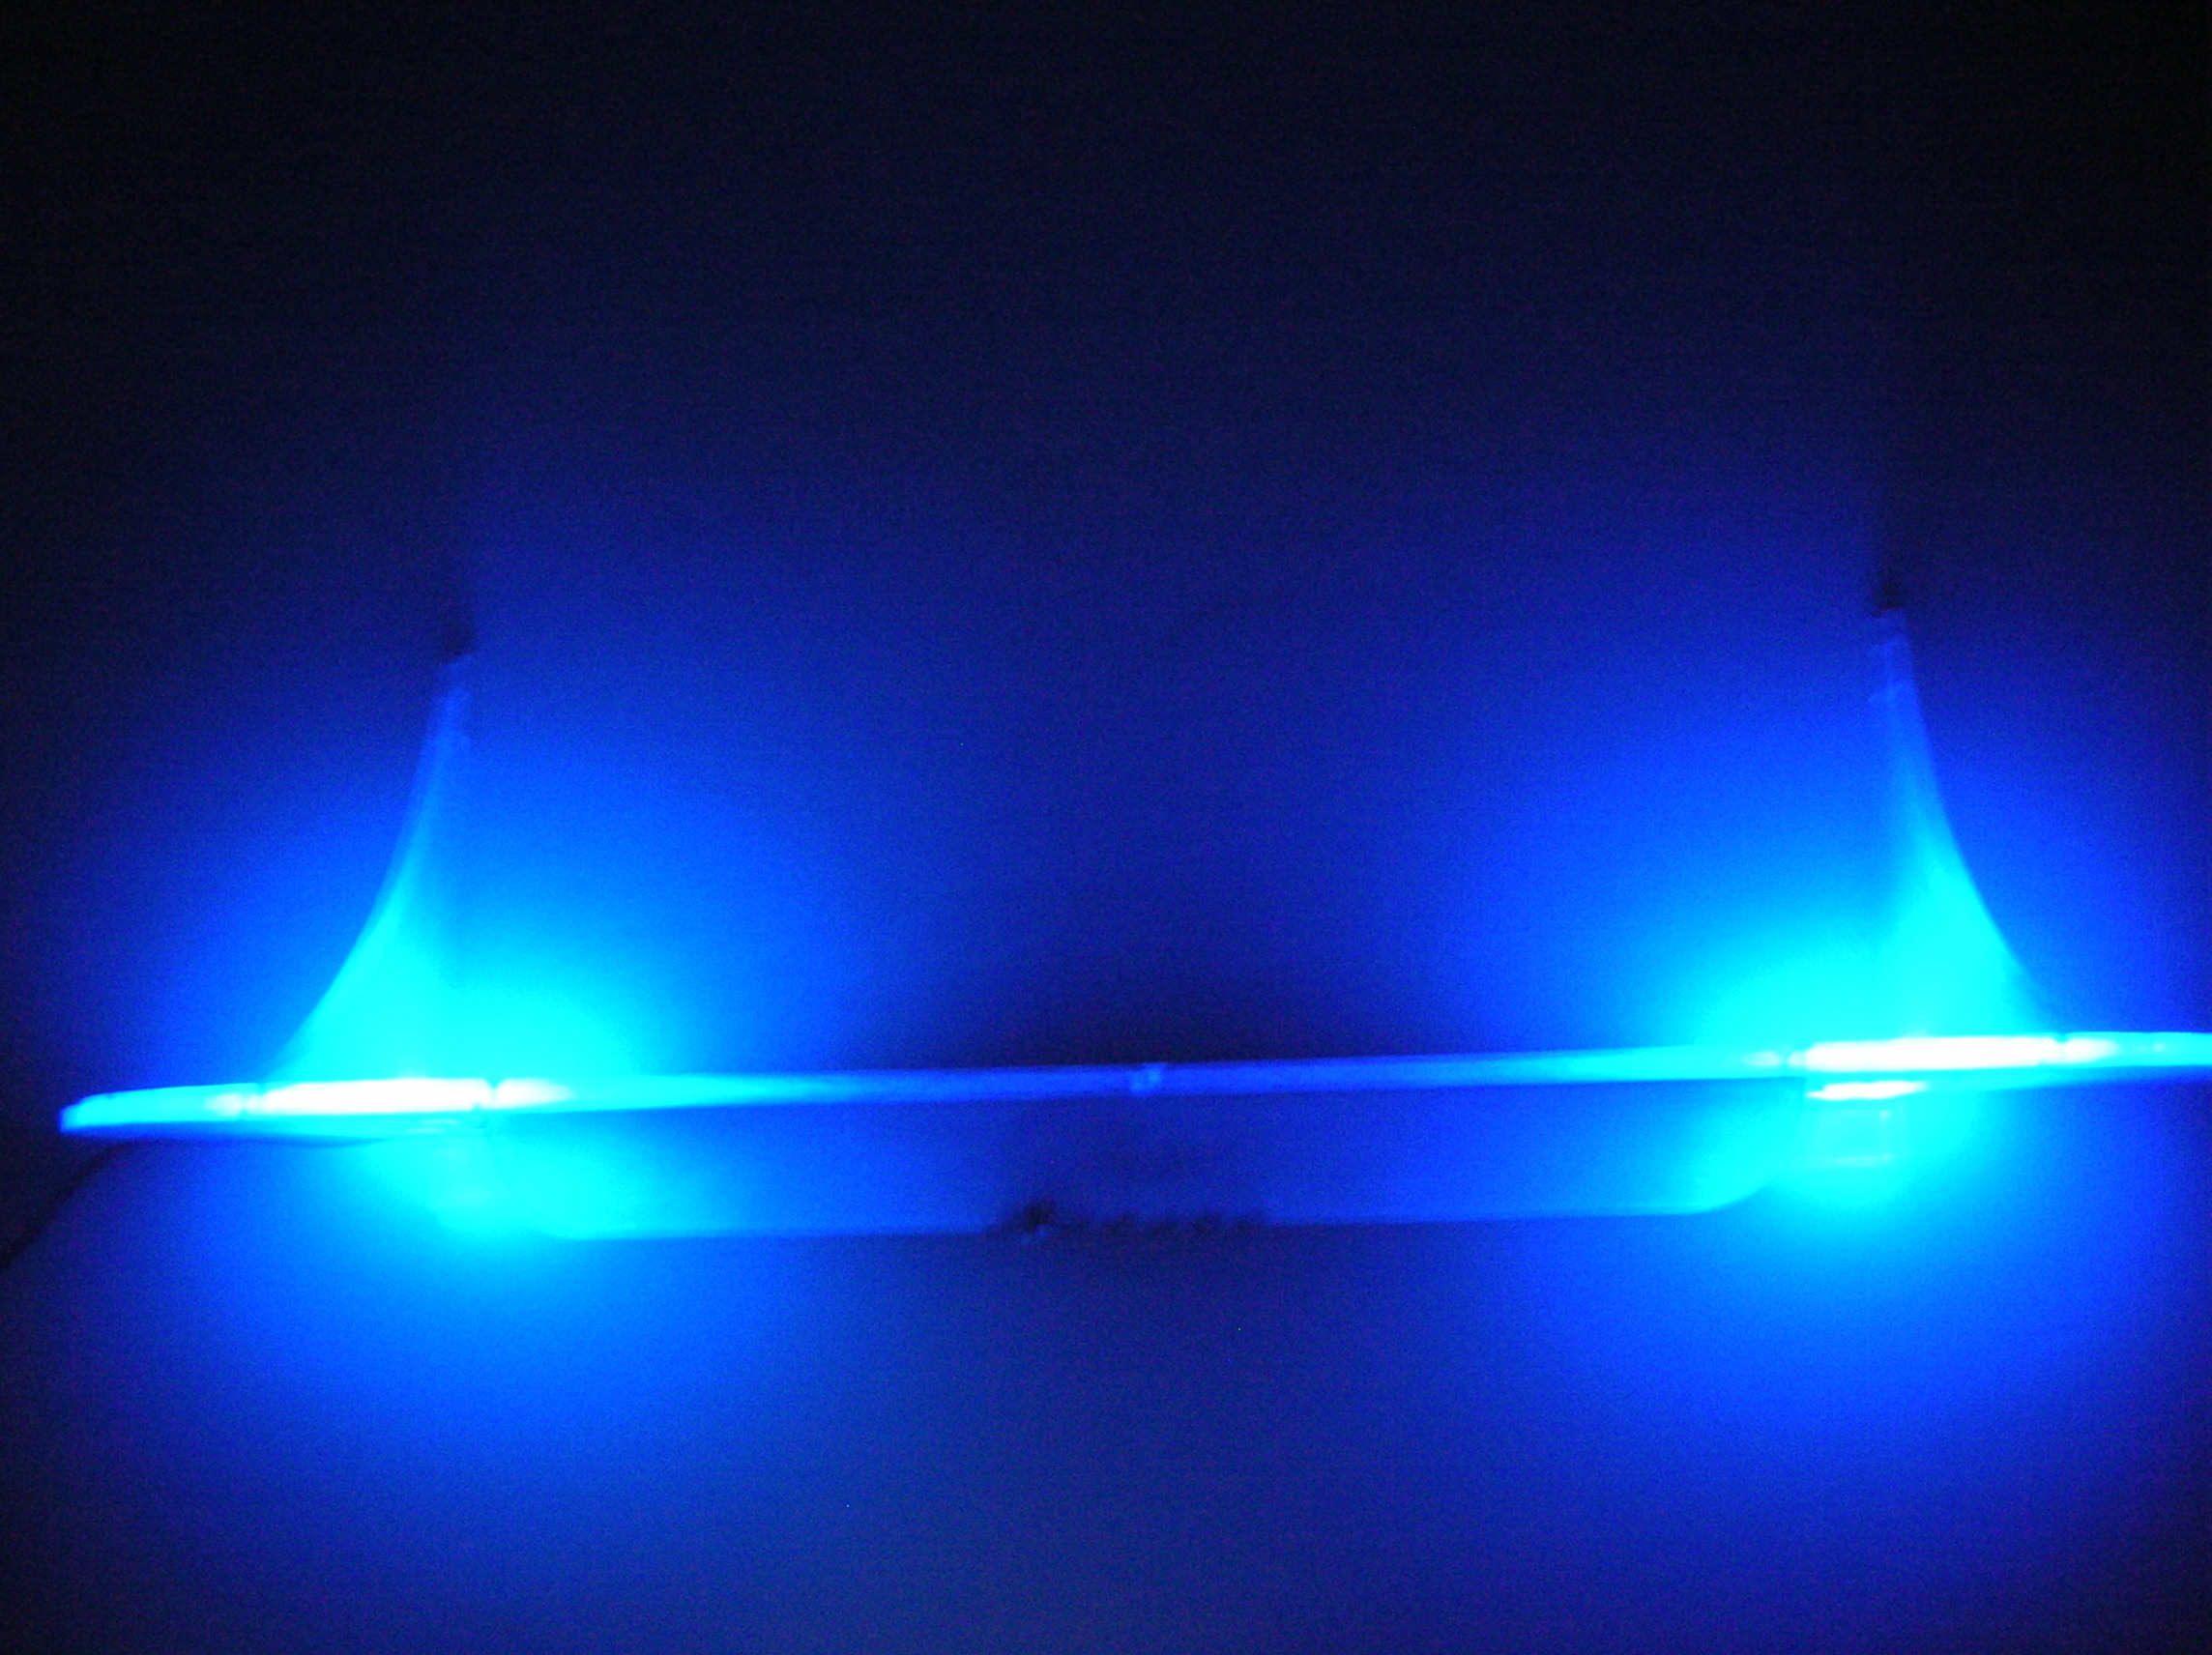 P�ka RGB zintegrowana z lampk� na biurko.